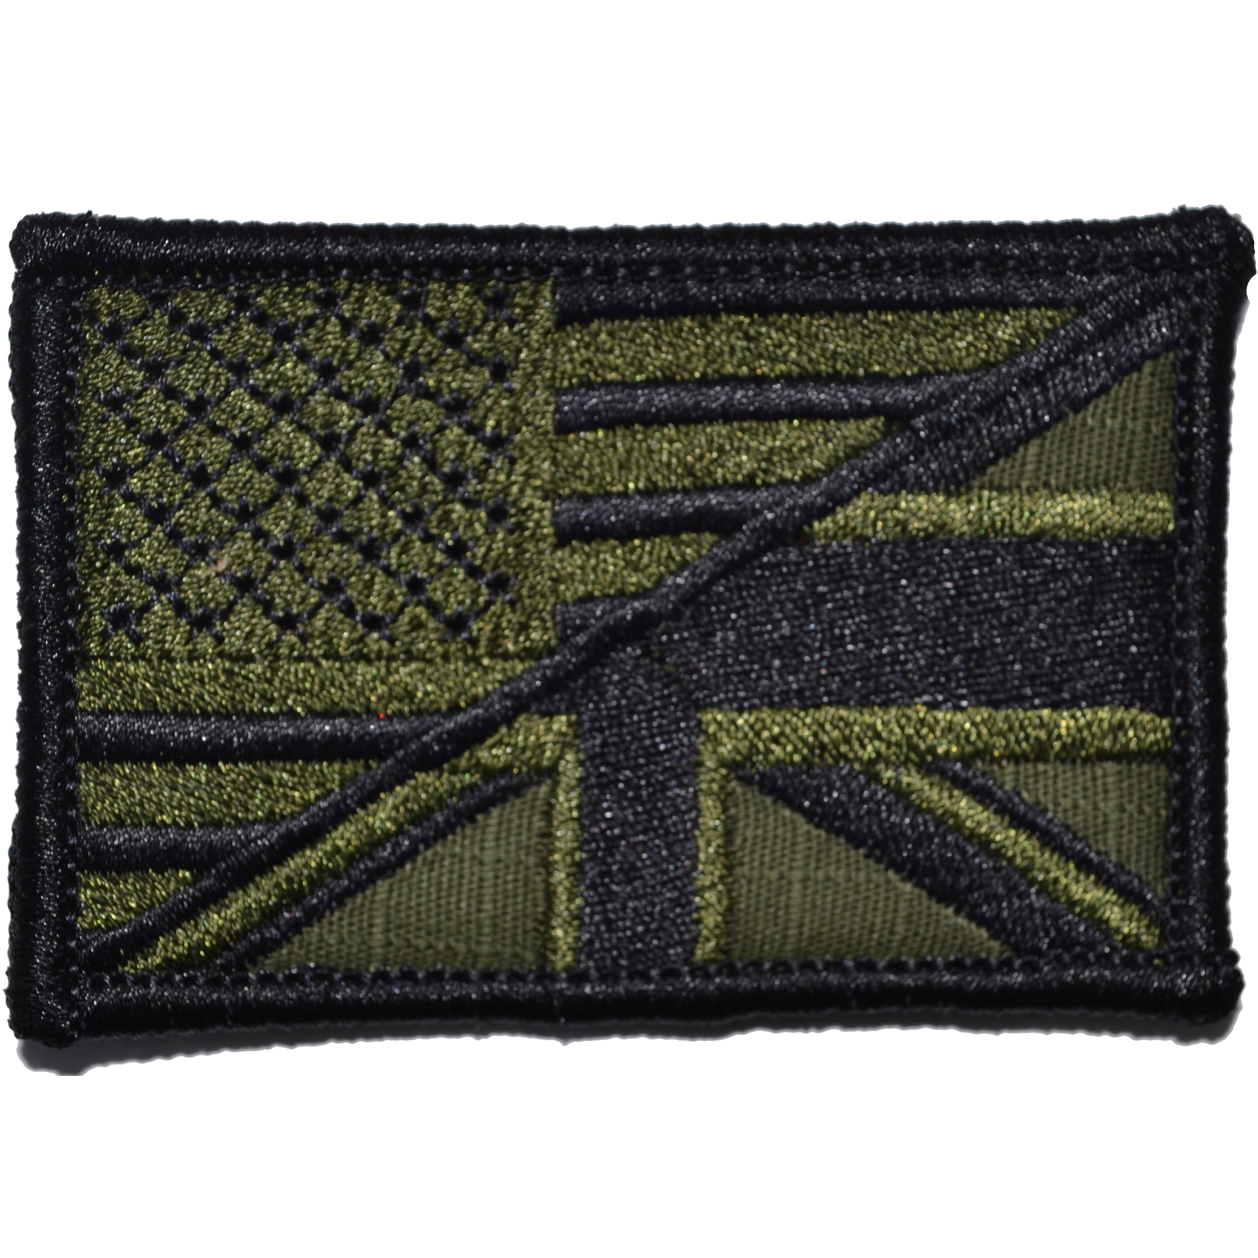 British Union Jack / USA Flag - 2x3 Patch